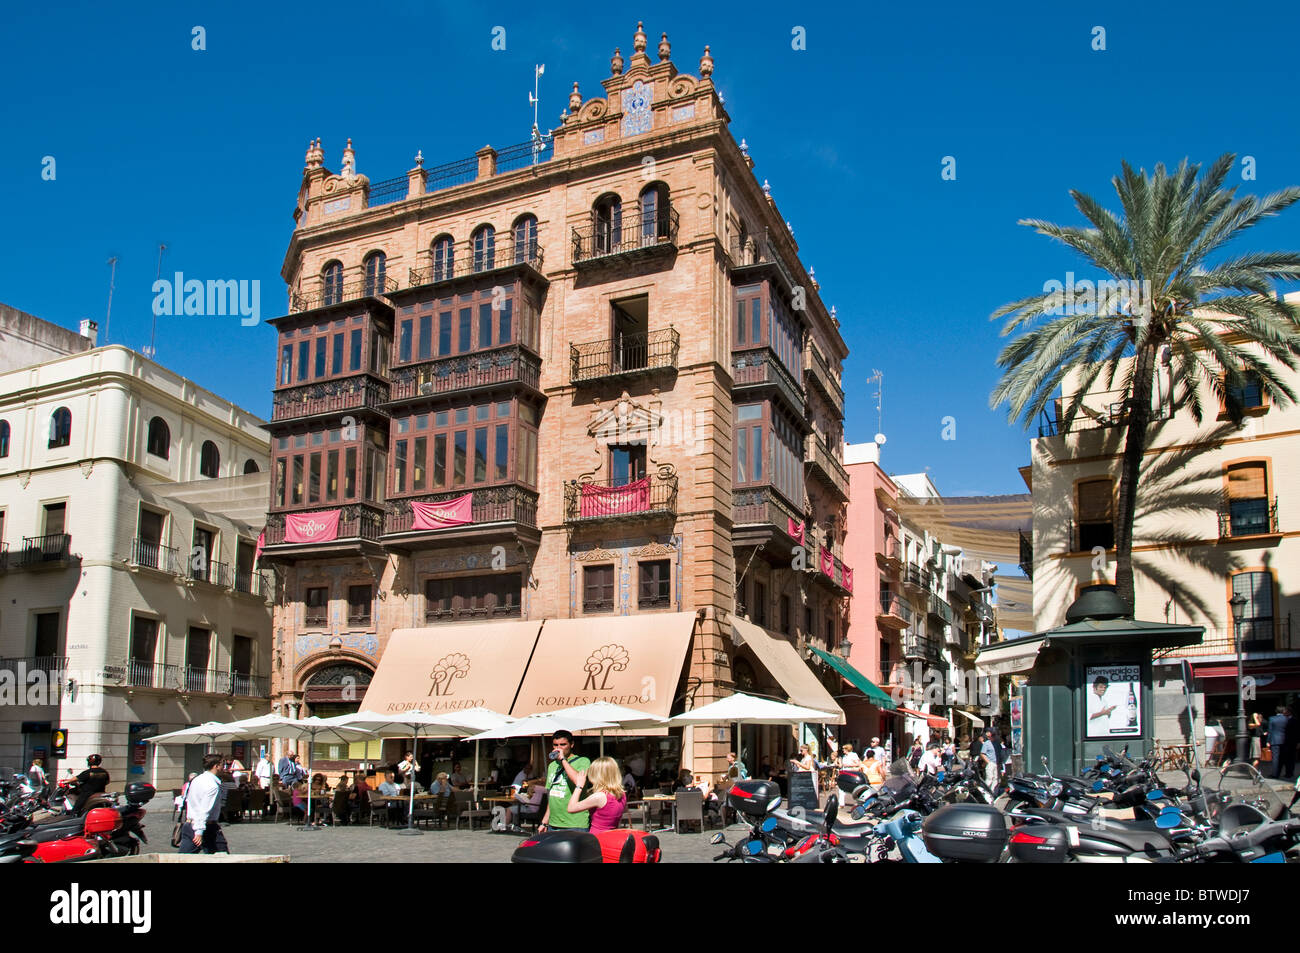 Seville Spain  Dona Maria Coronel old City Center Stock Photo